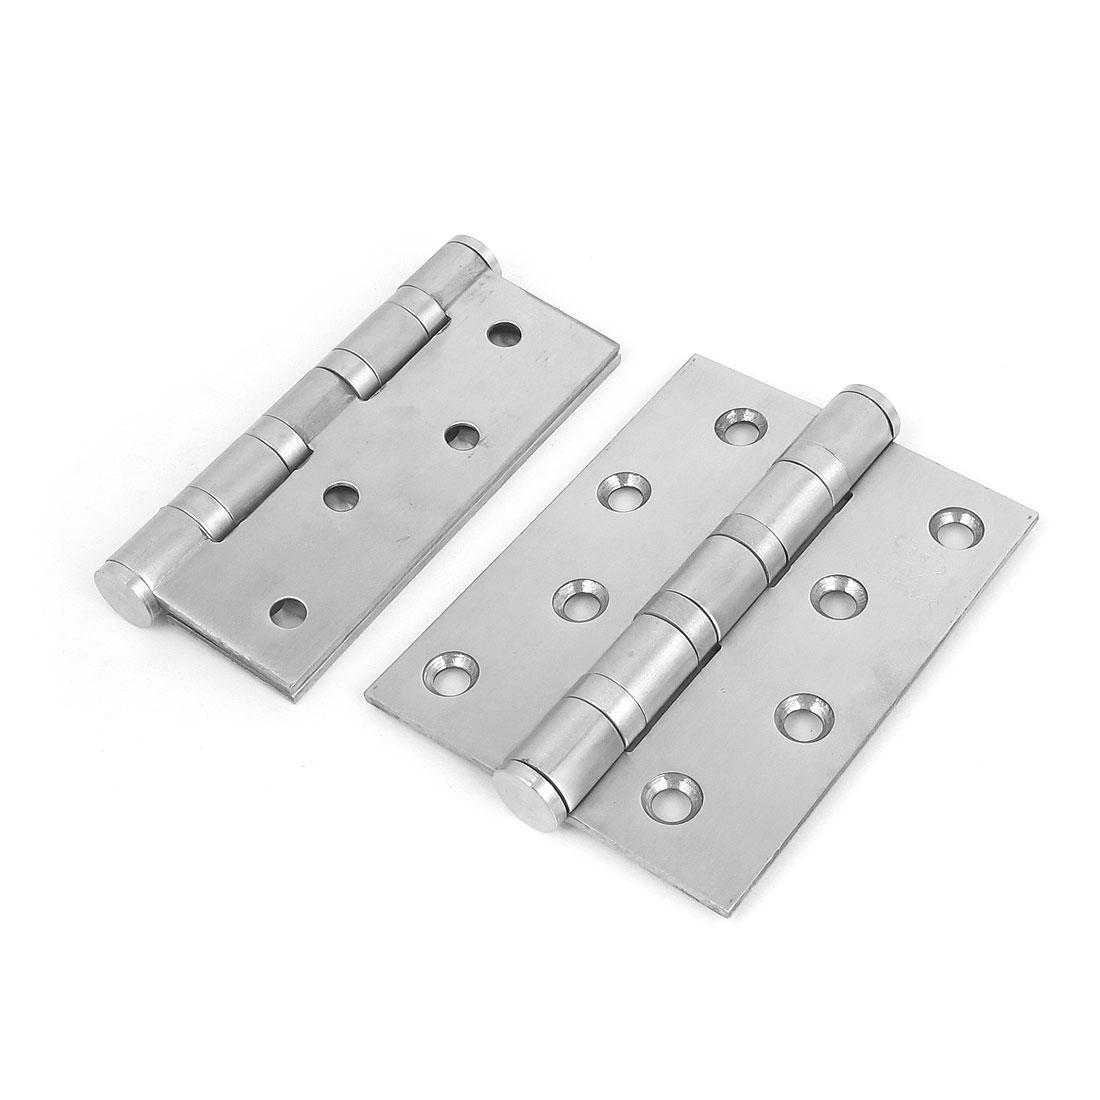 "2pcs Cupboard Cabinet 304 Stainless Steel Folding Door Butt Hinges 4"" x 3"" x 3mm"